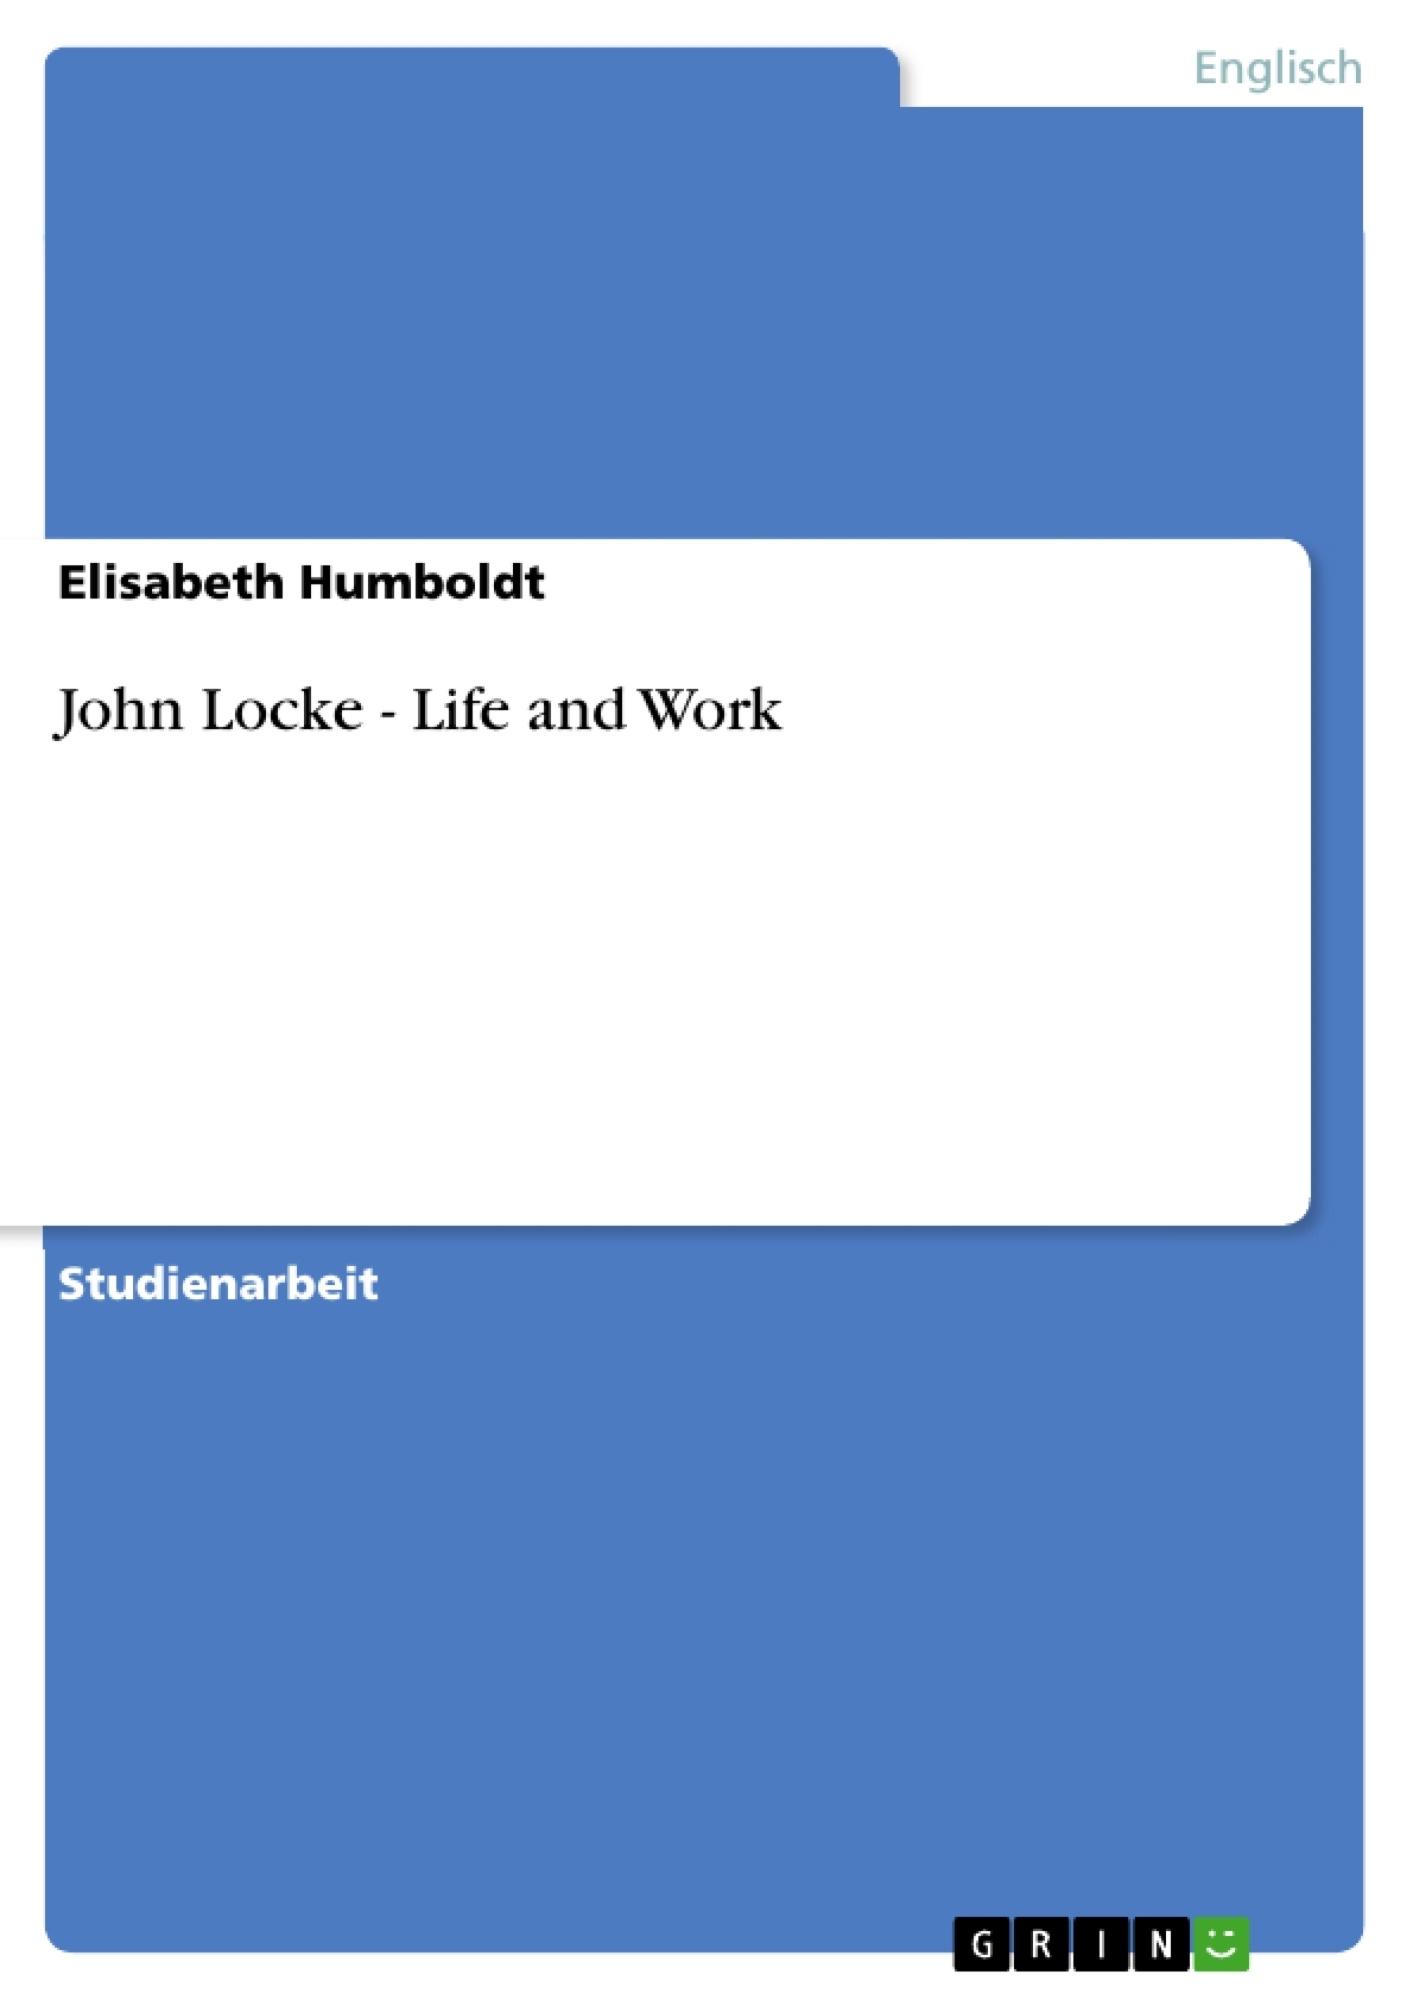 Titel: John Locke - Life and Work